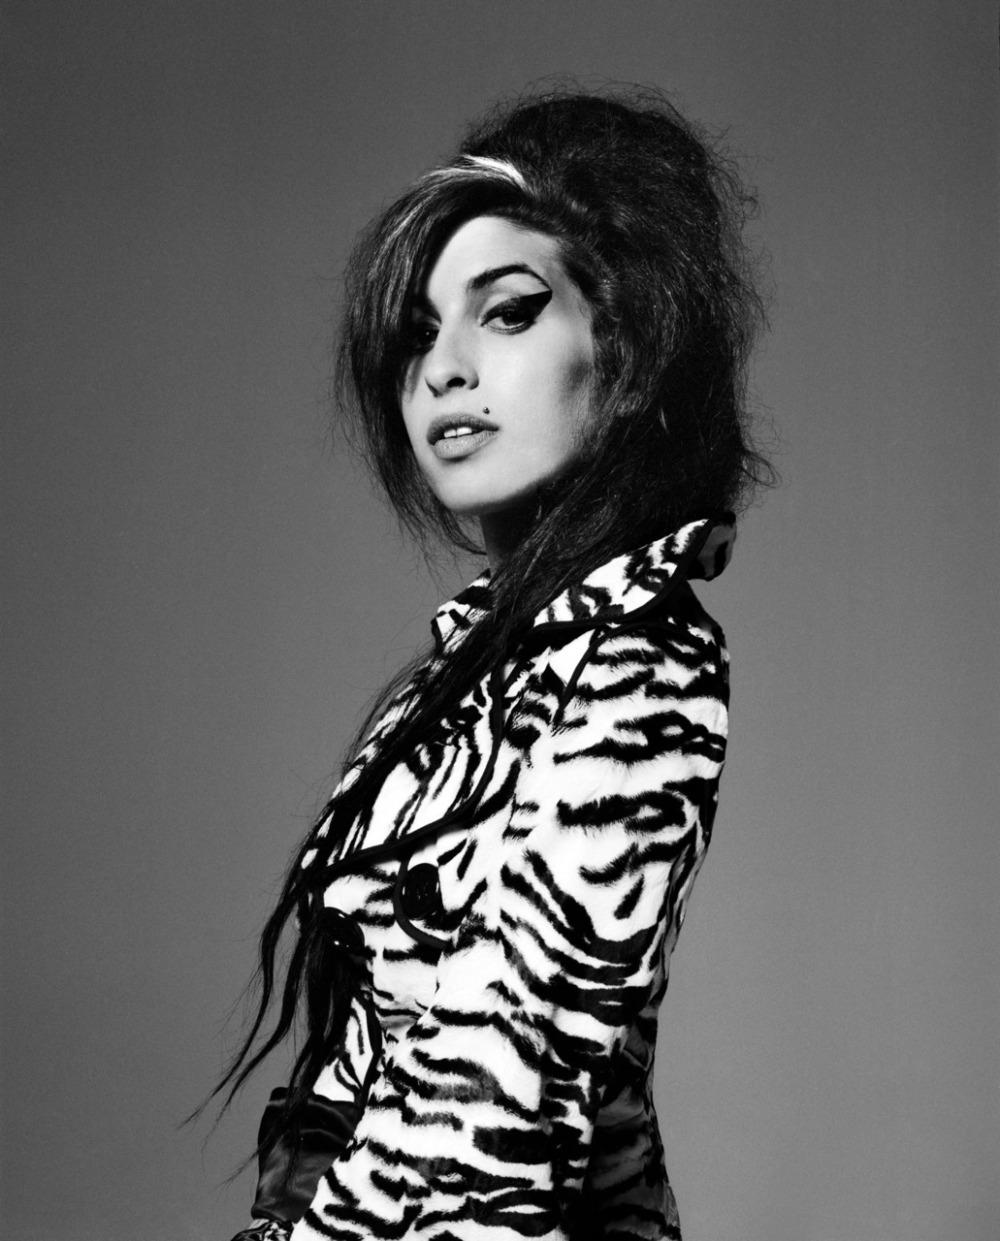 Amy Winehouse - Portraits